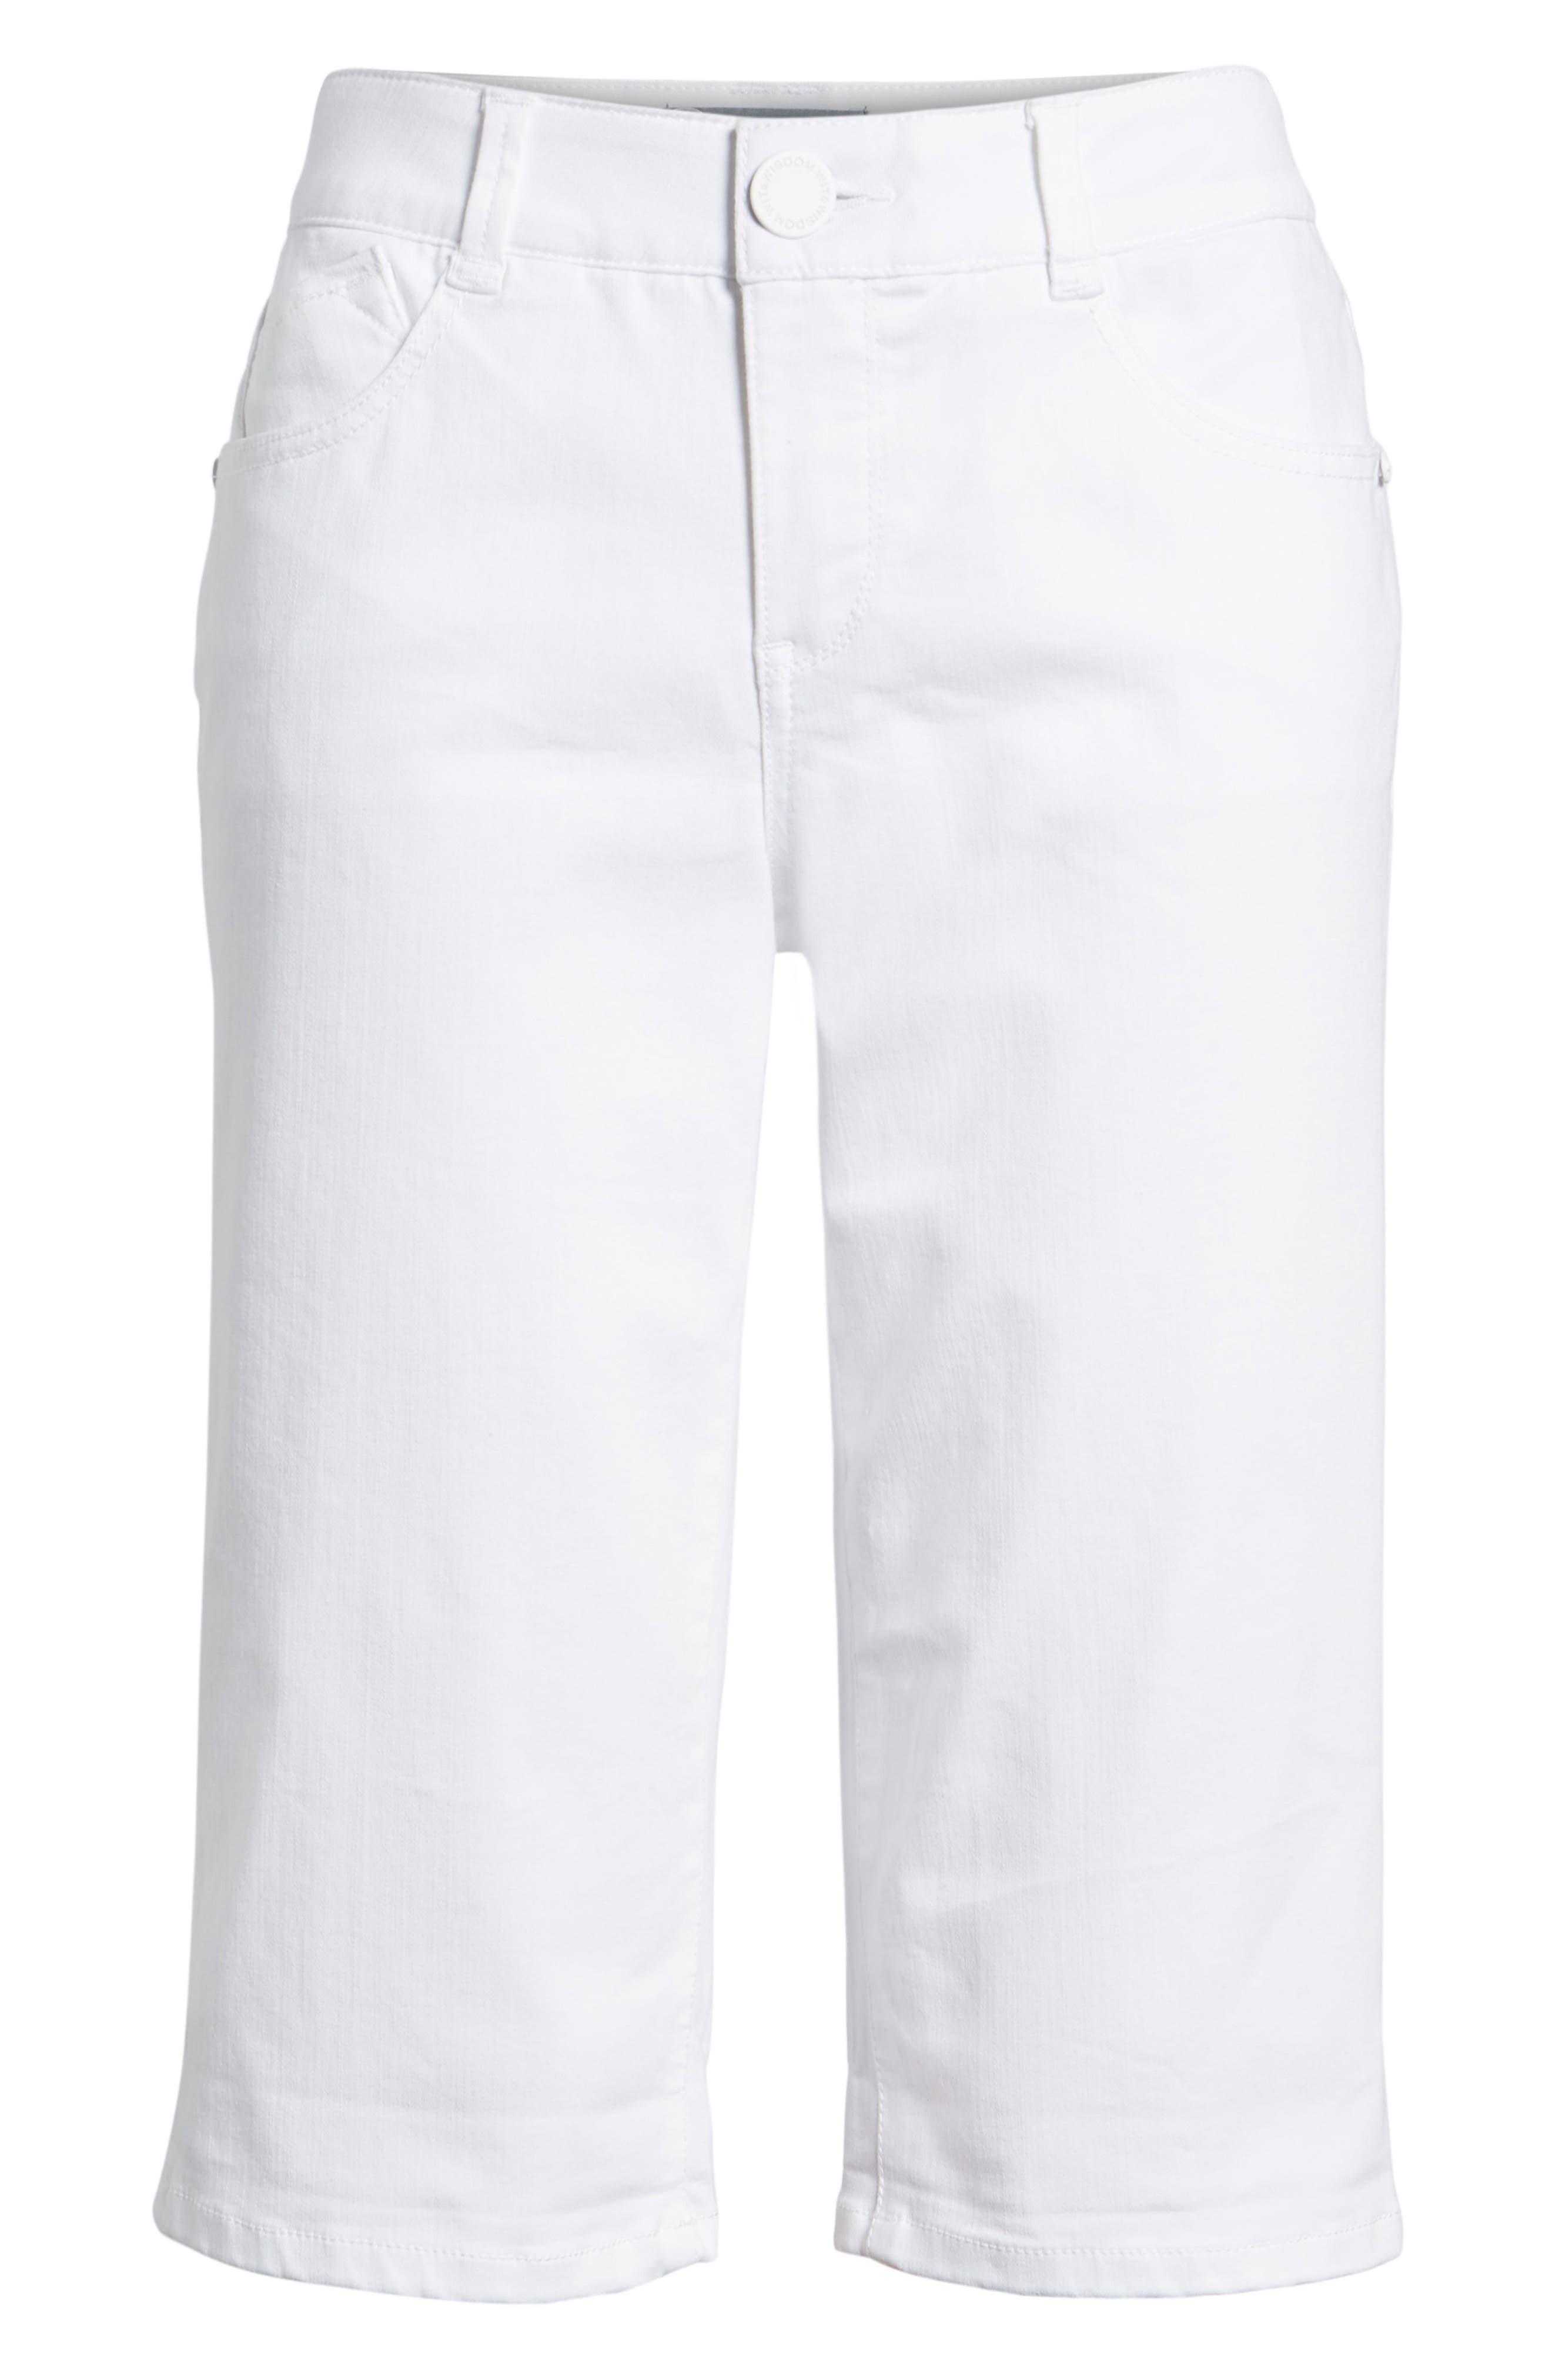 WIT & WISDOM, Ab-solution White Bermuda Shorts, Alternate thumbnail 7, color, OPTIC WHITE